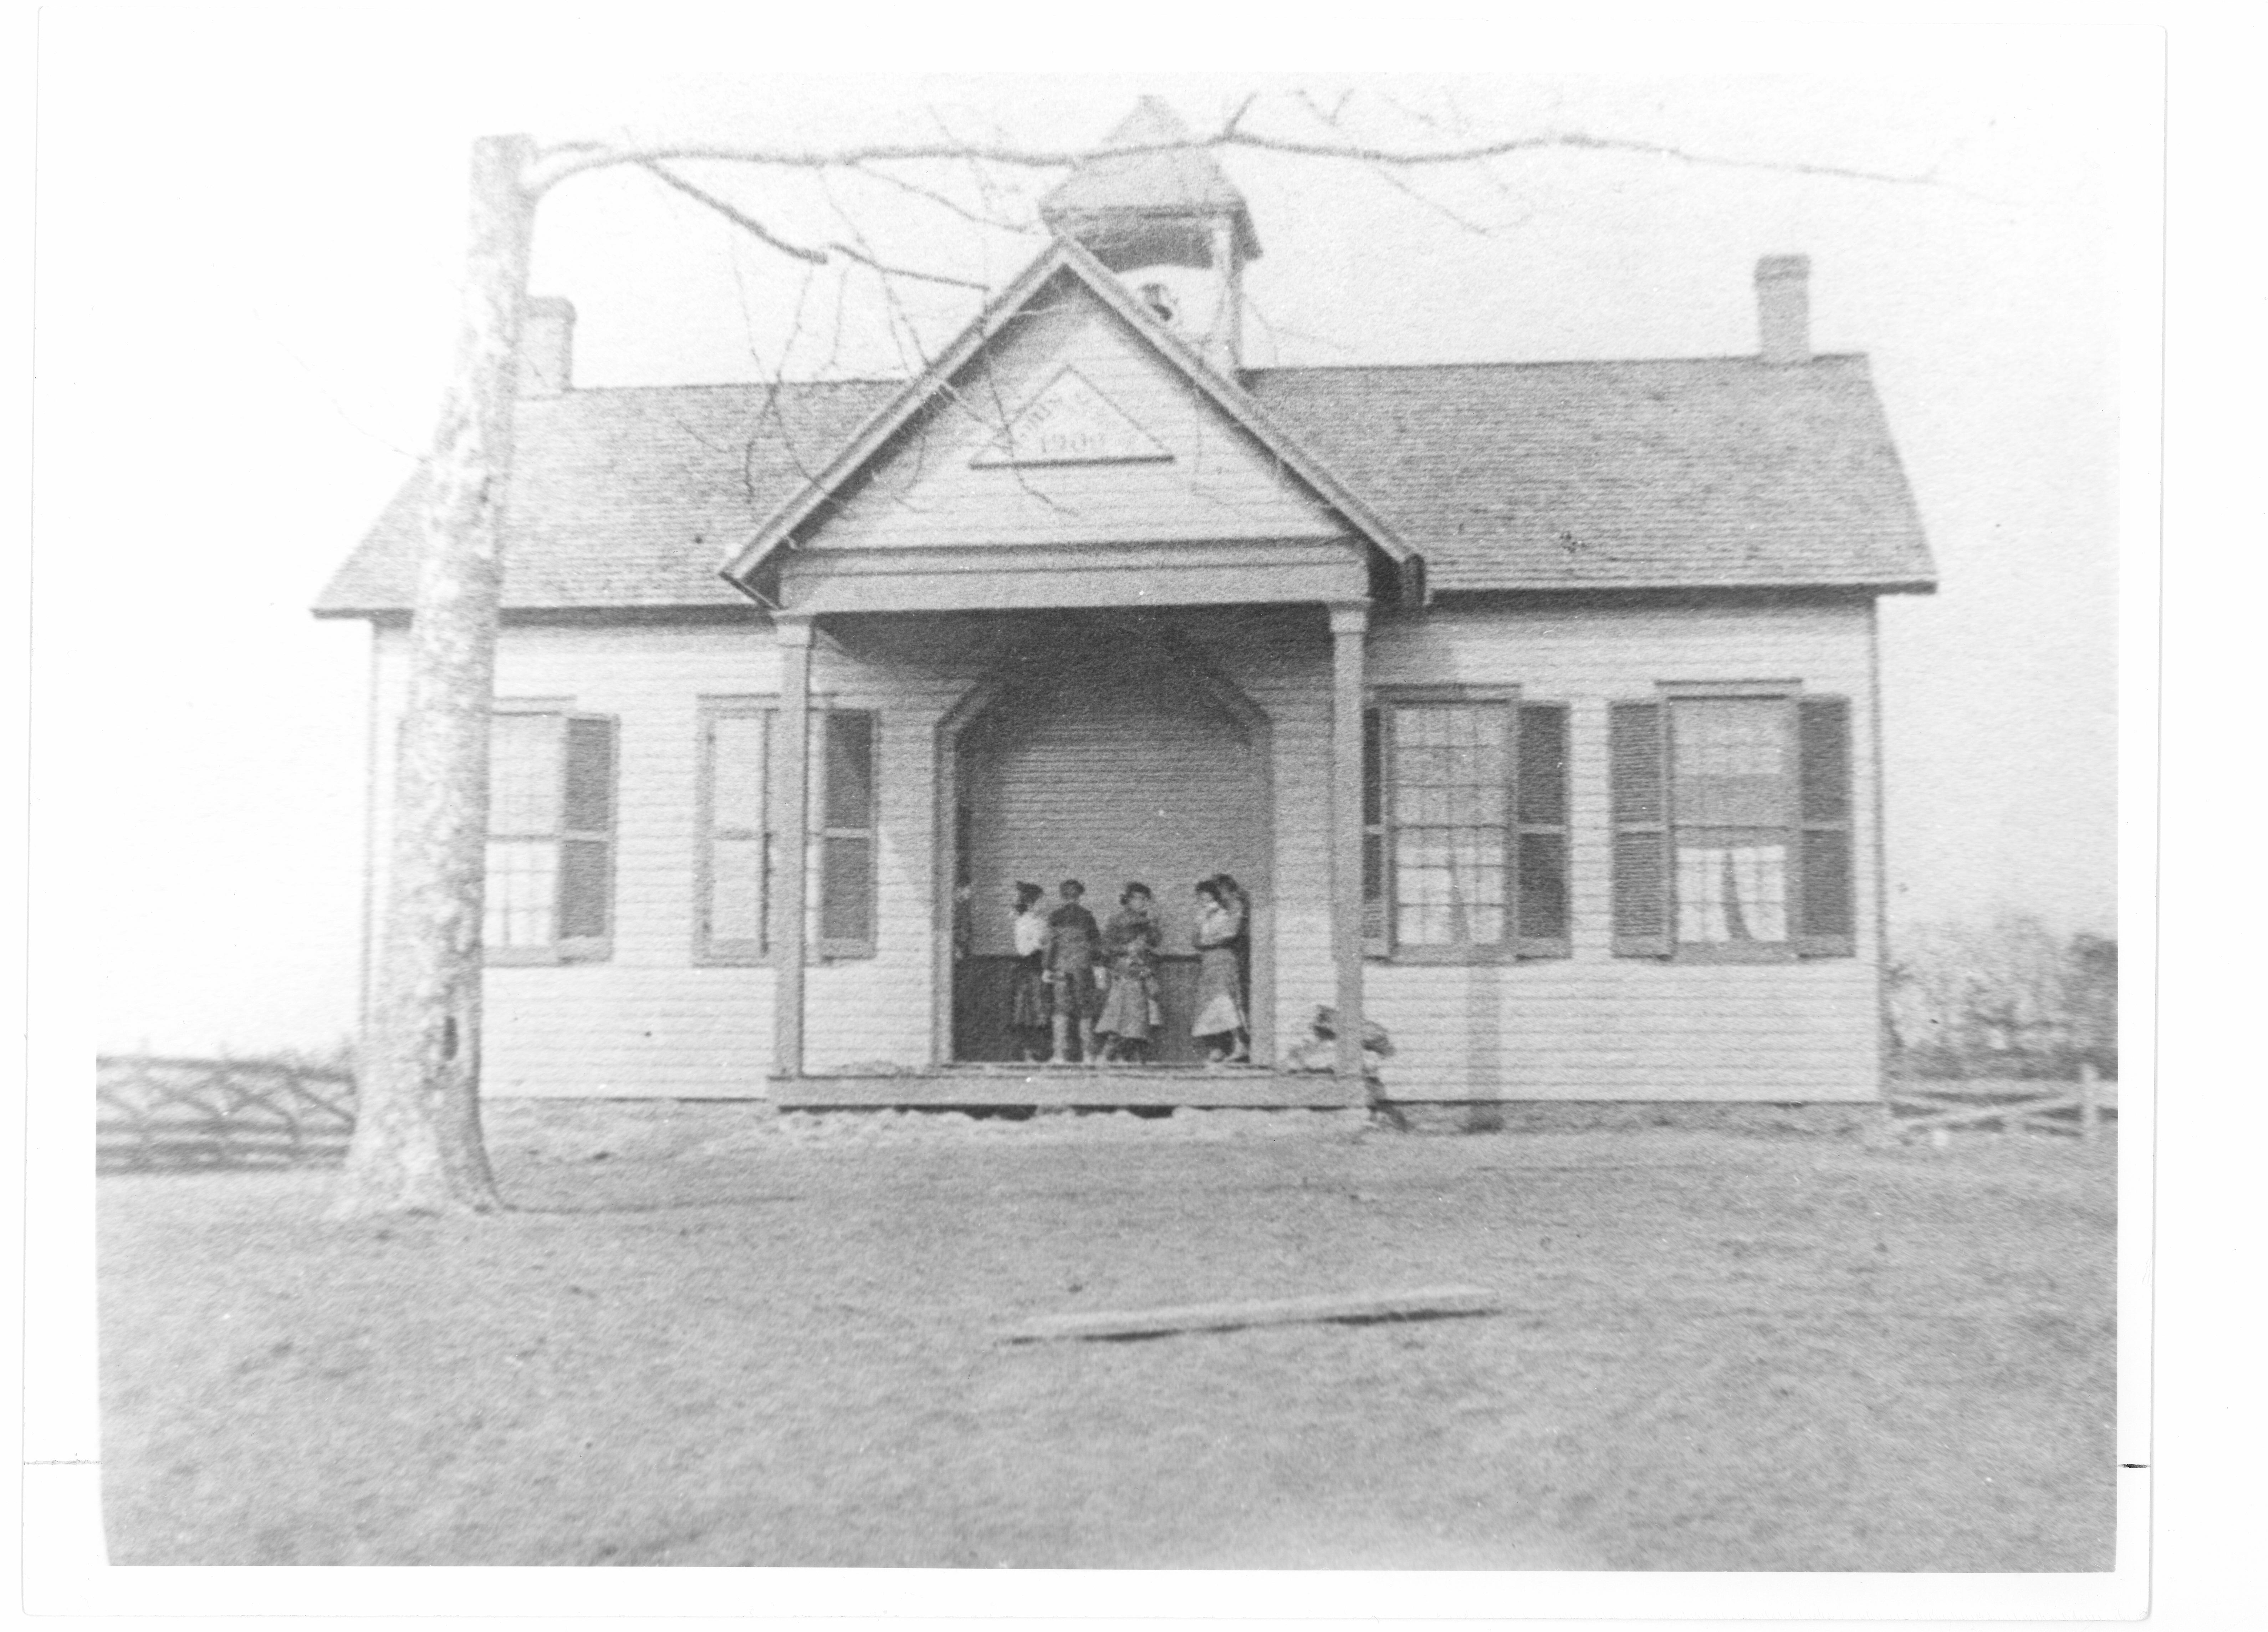 Forgotten Fairfax: Fairfax County Public Schools A Visual History